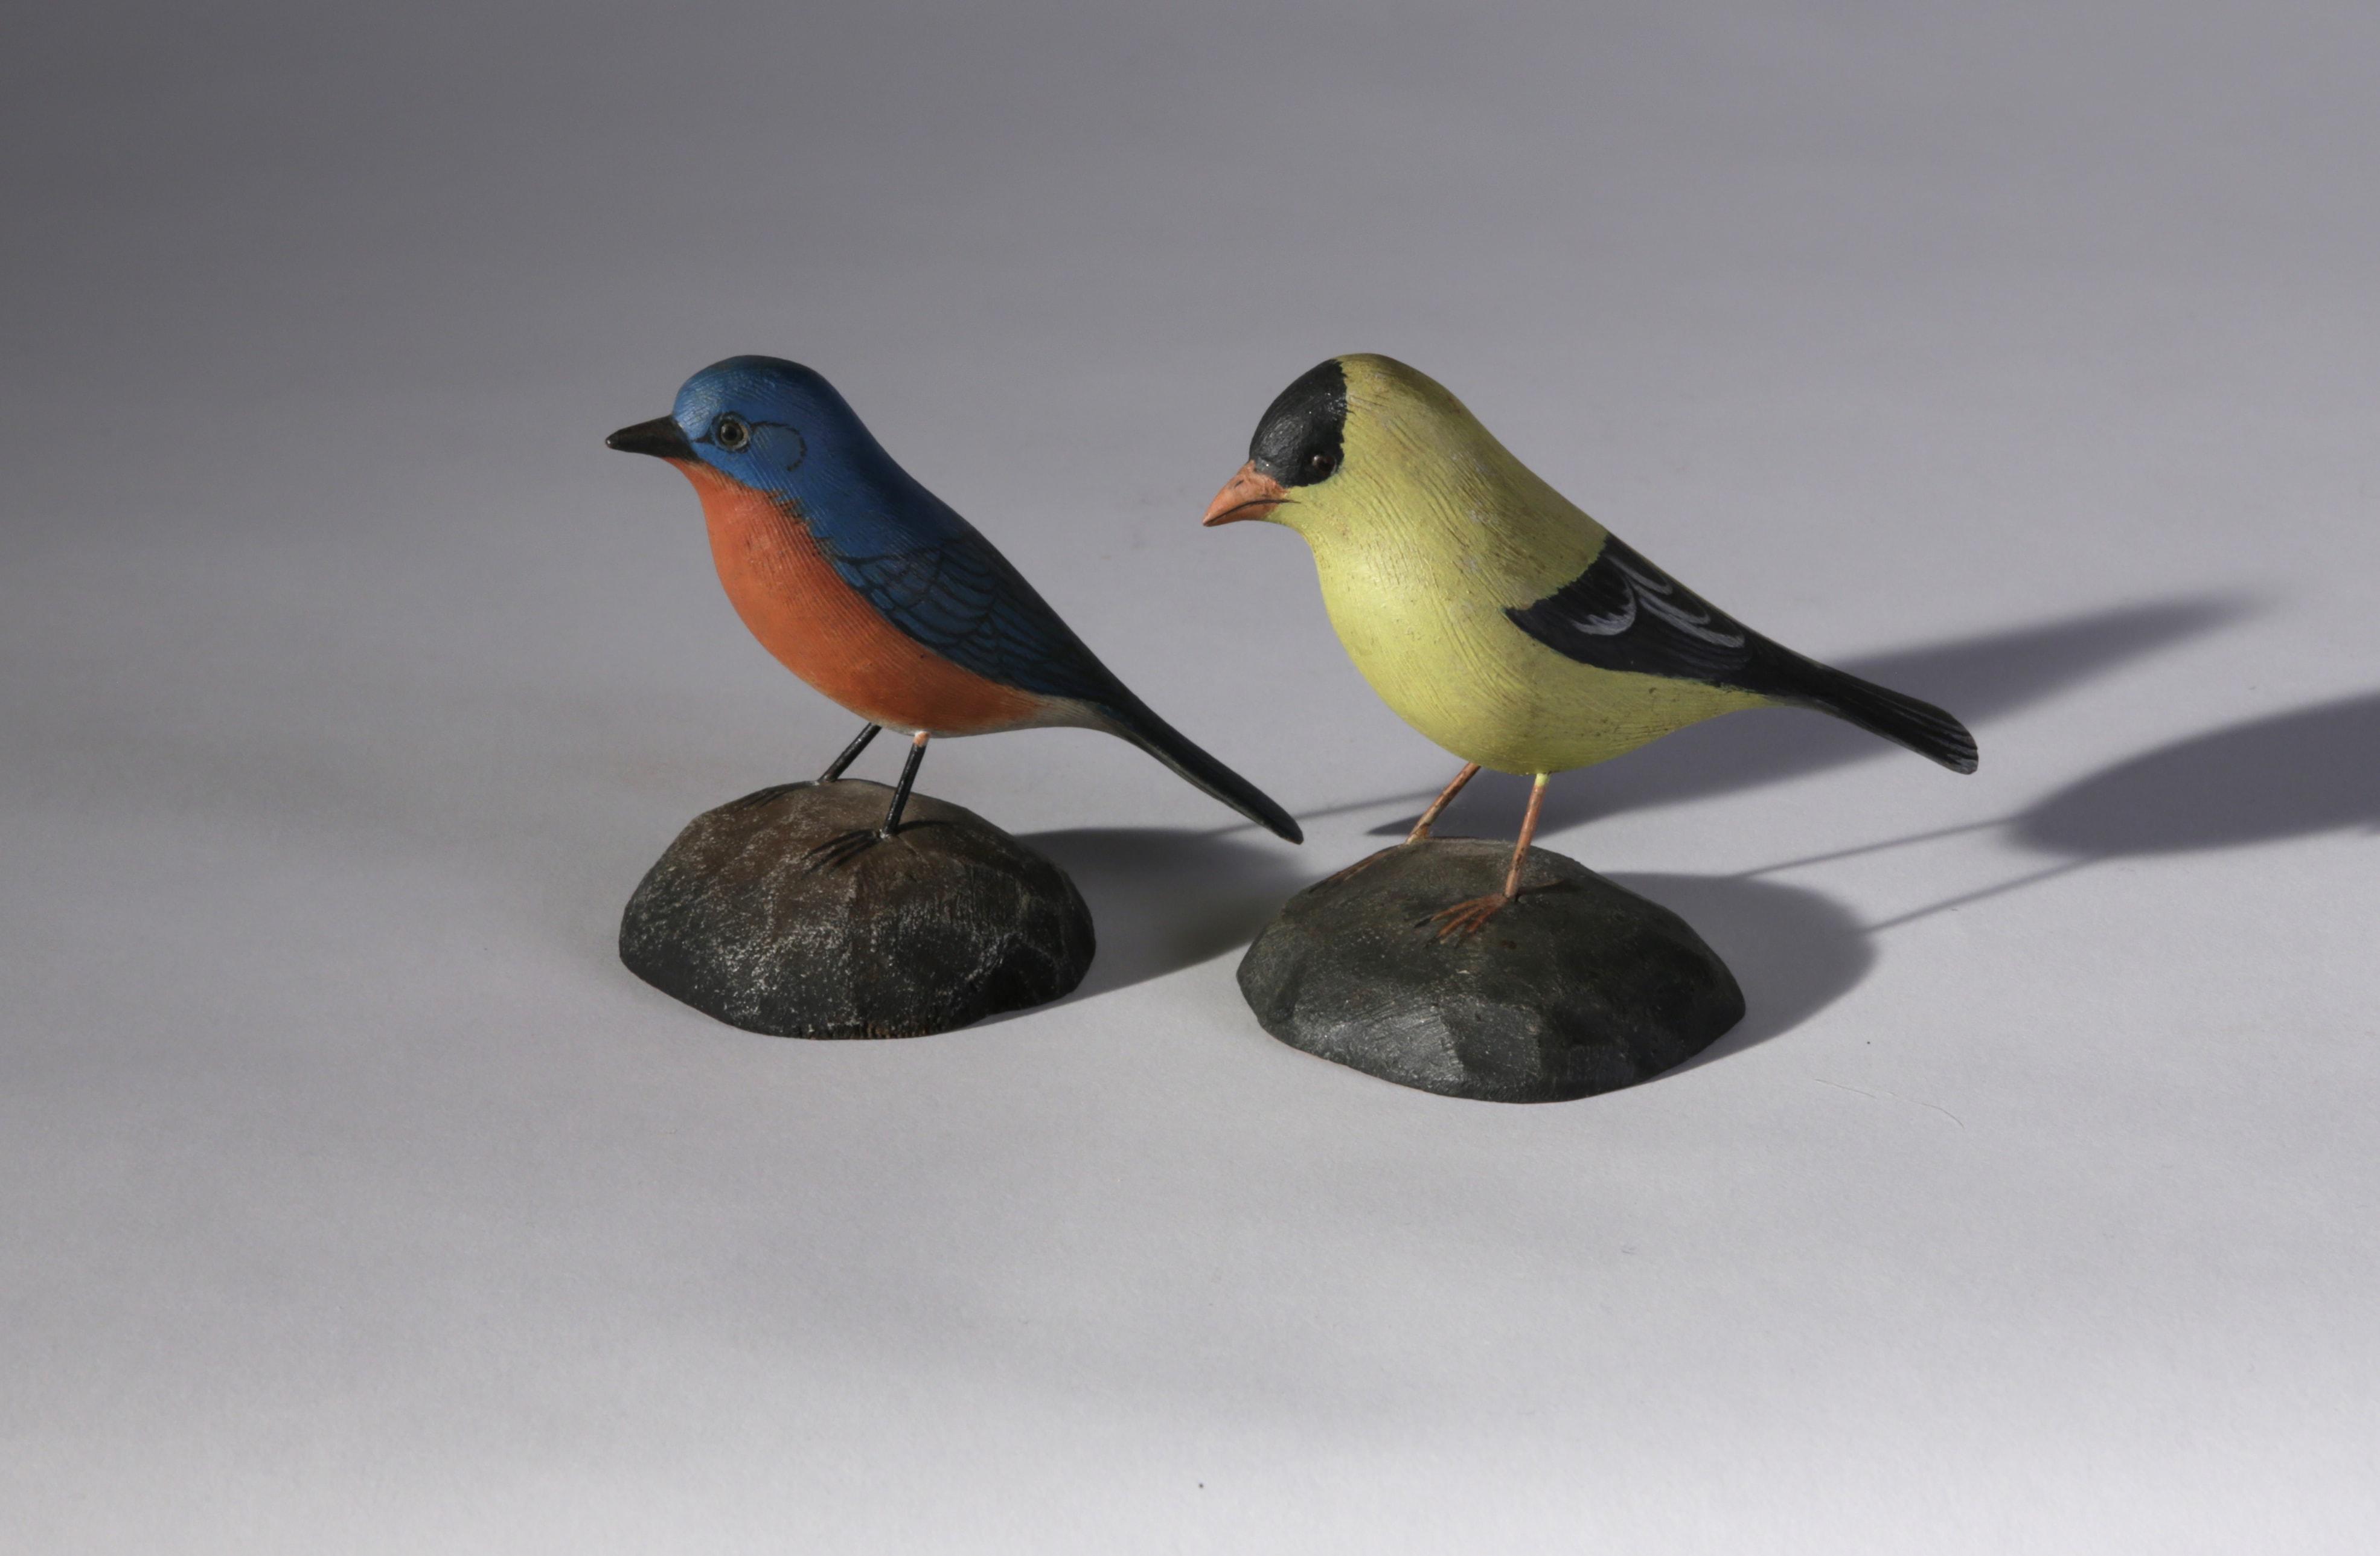 Miniature Bluebird And Gold Finch By Jess Blackstone